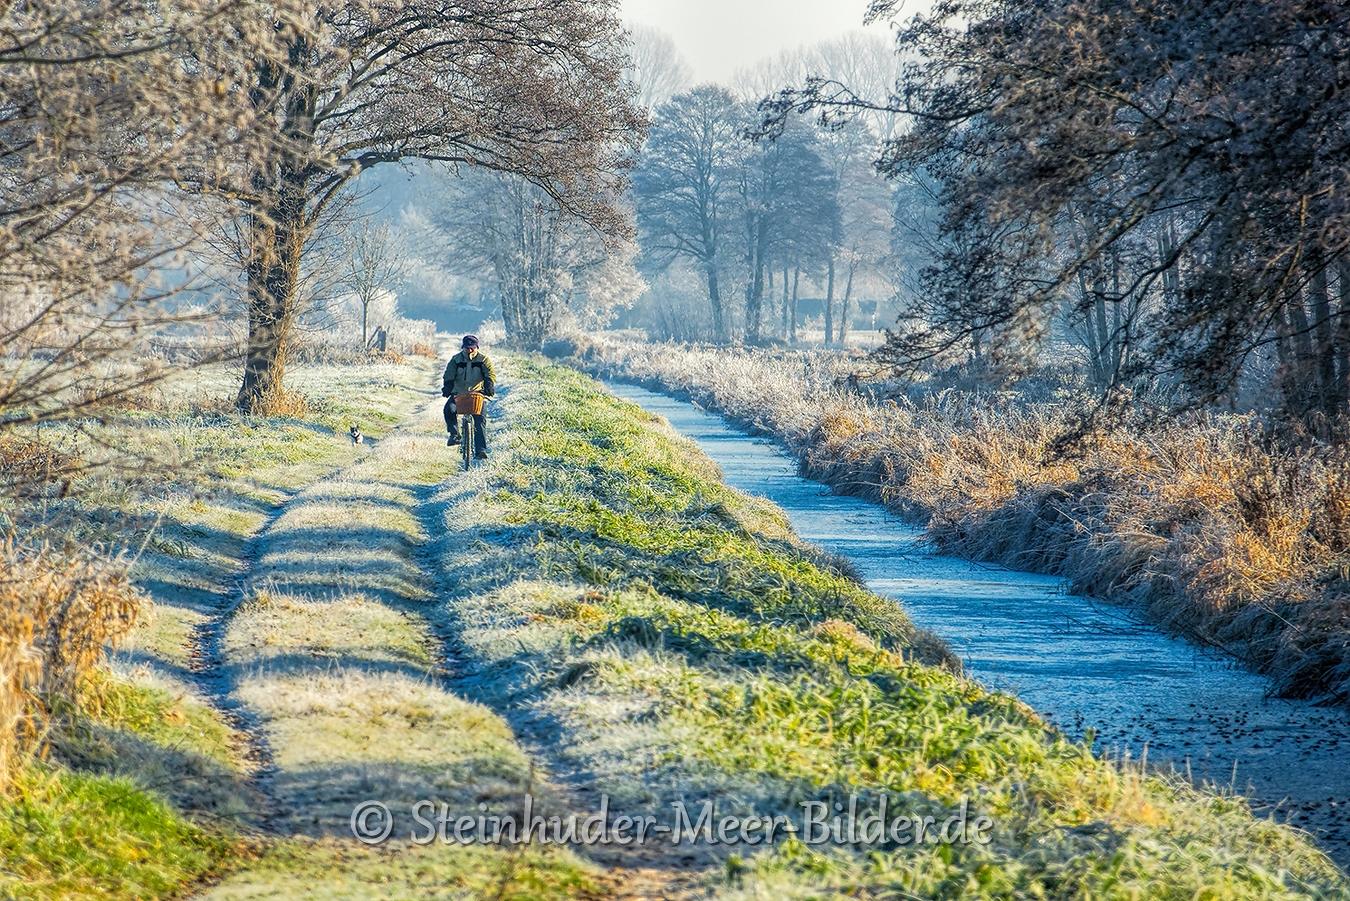 winter-meerbruch-eisdecke-raureif-bilder-landschaften-steinhuder-meer-fotos-RX_00458